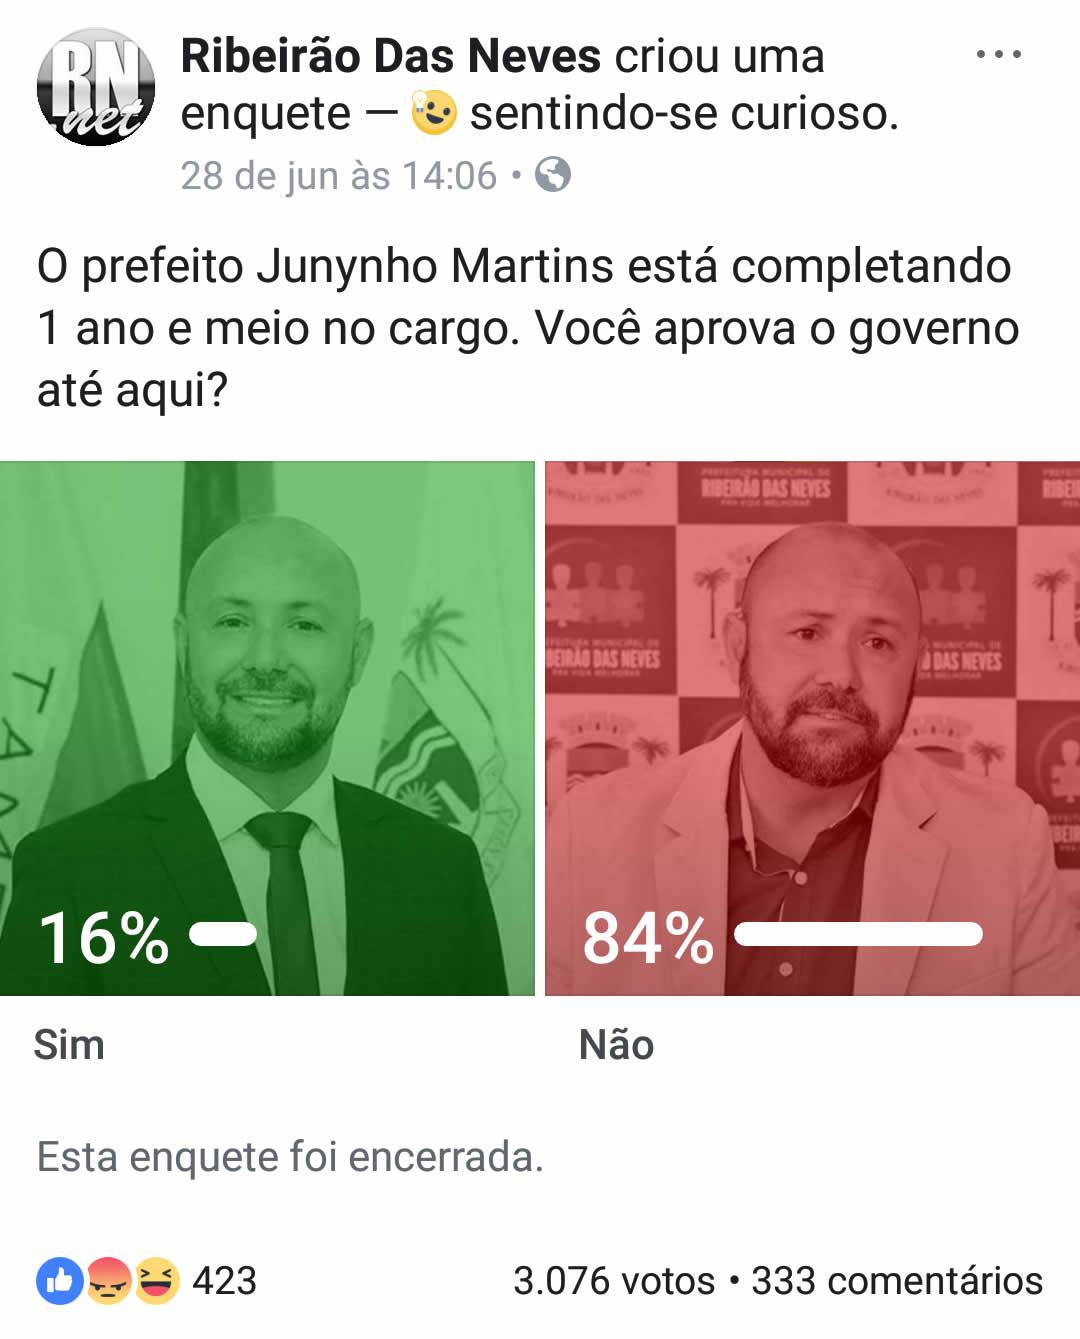 Junynho Martins